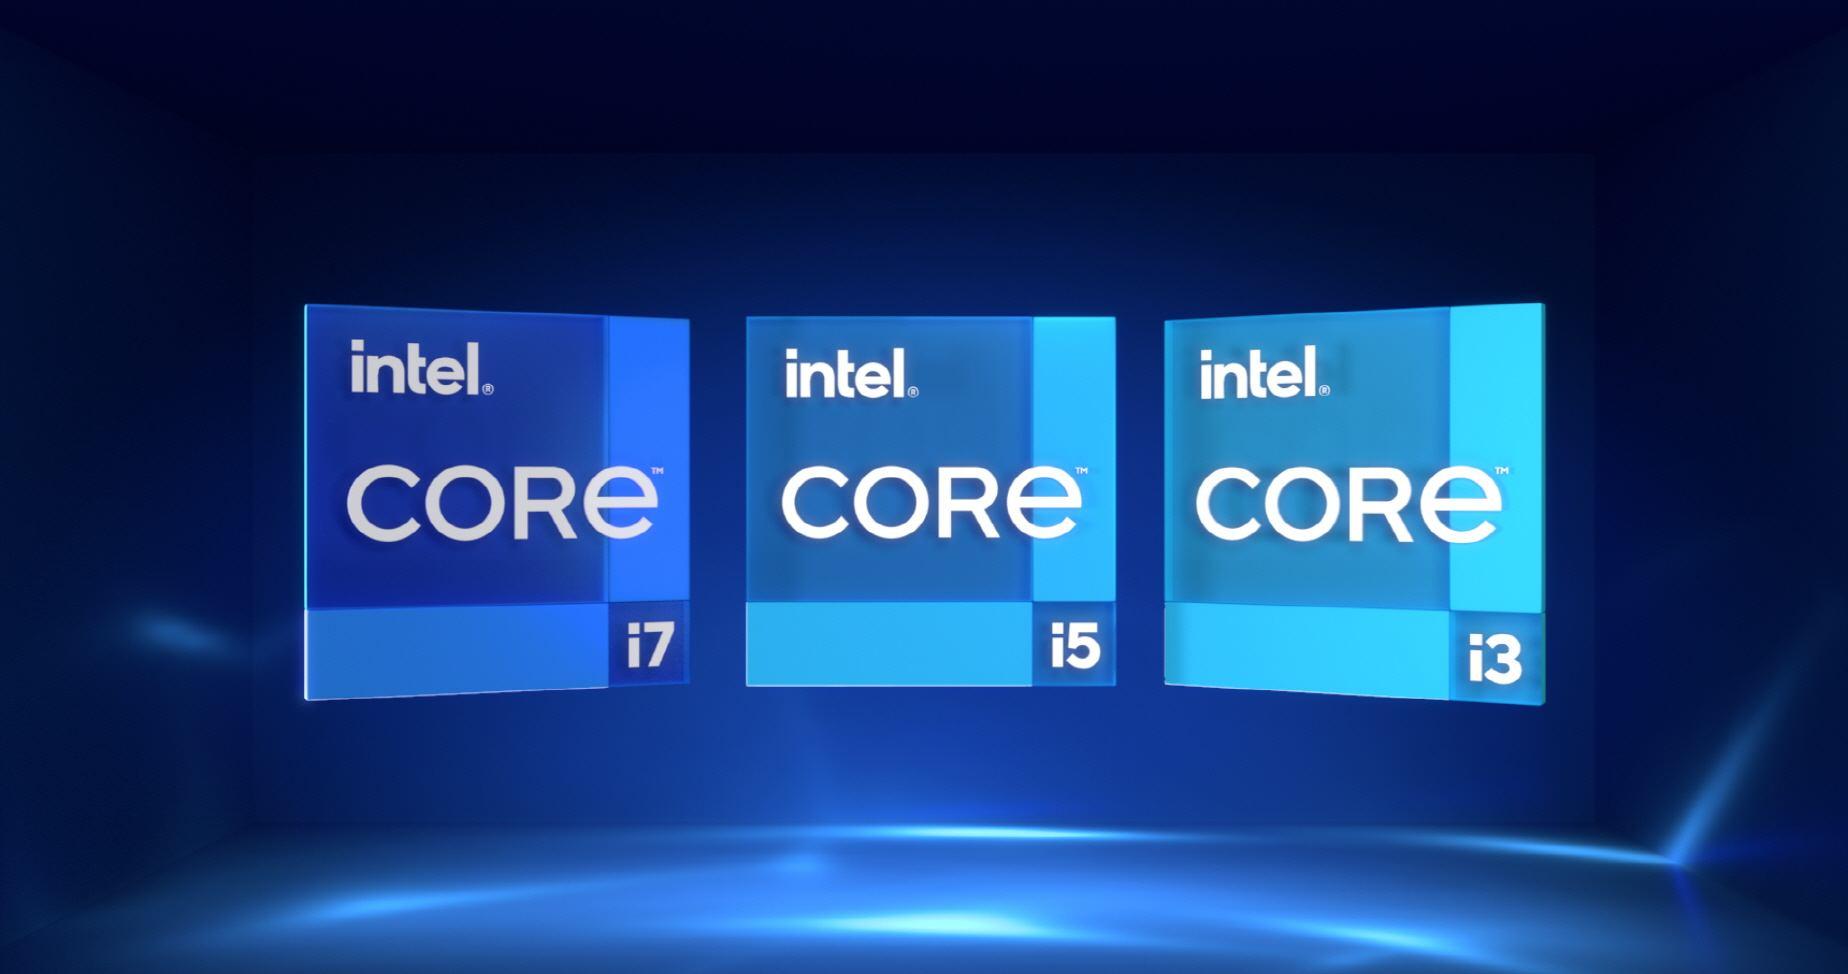 11th Gen Intel Core processors with Intel Iris Xe graphics.jpg: